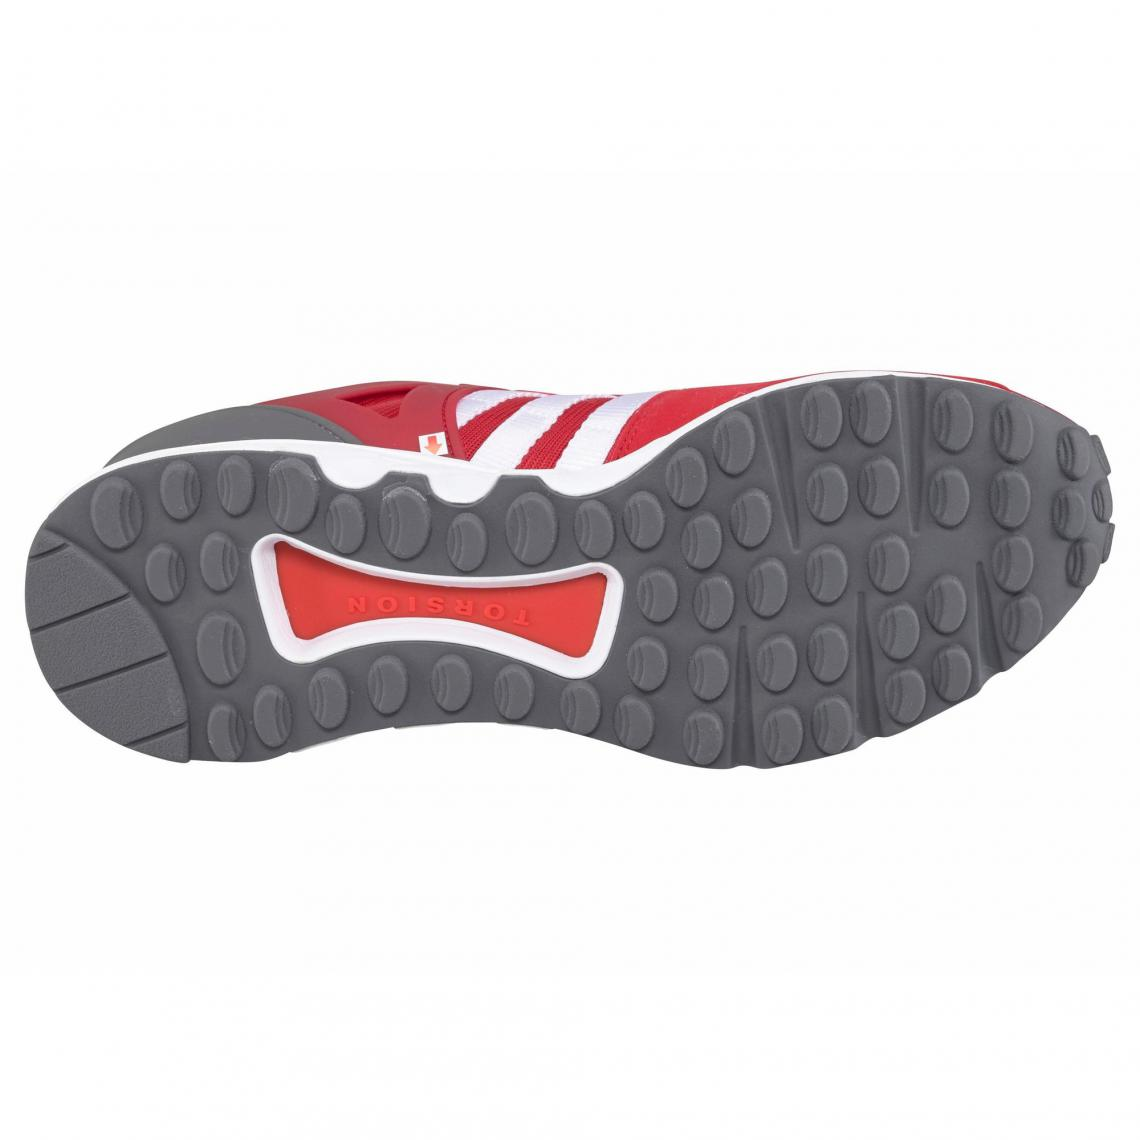 online store a7911 100a4 adidas Originals EQT Support RF chaussures de running homme - Rouge - Blanc  Adidas Originals